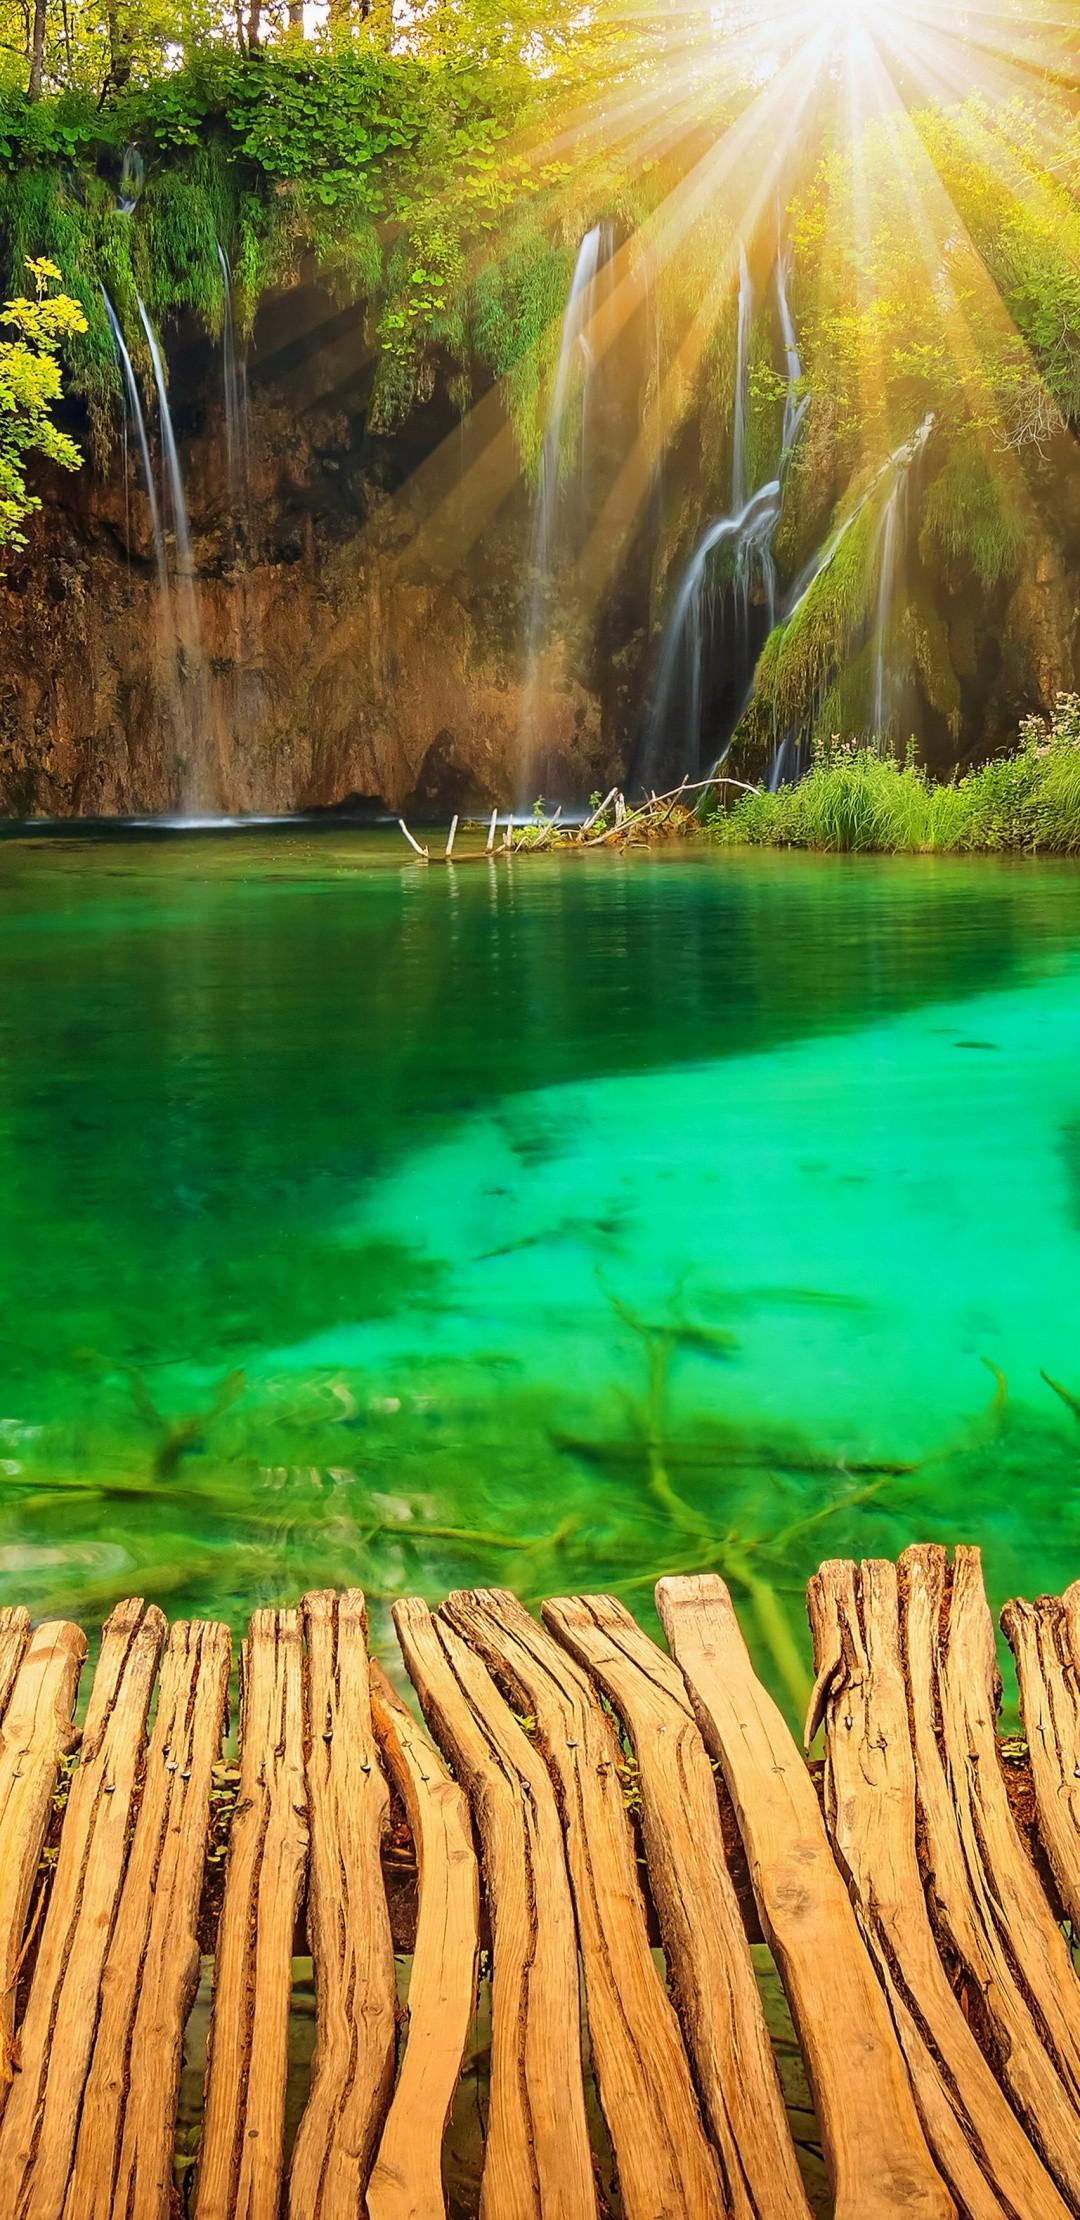 3d Bike Wallpaper Image Download Croatia Parks Lake Waterfall Plitvice Rays Of Light